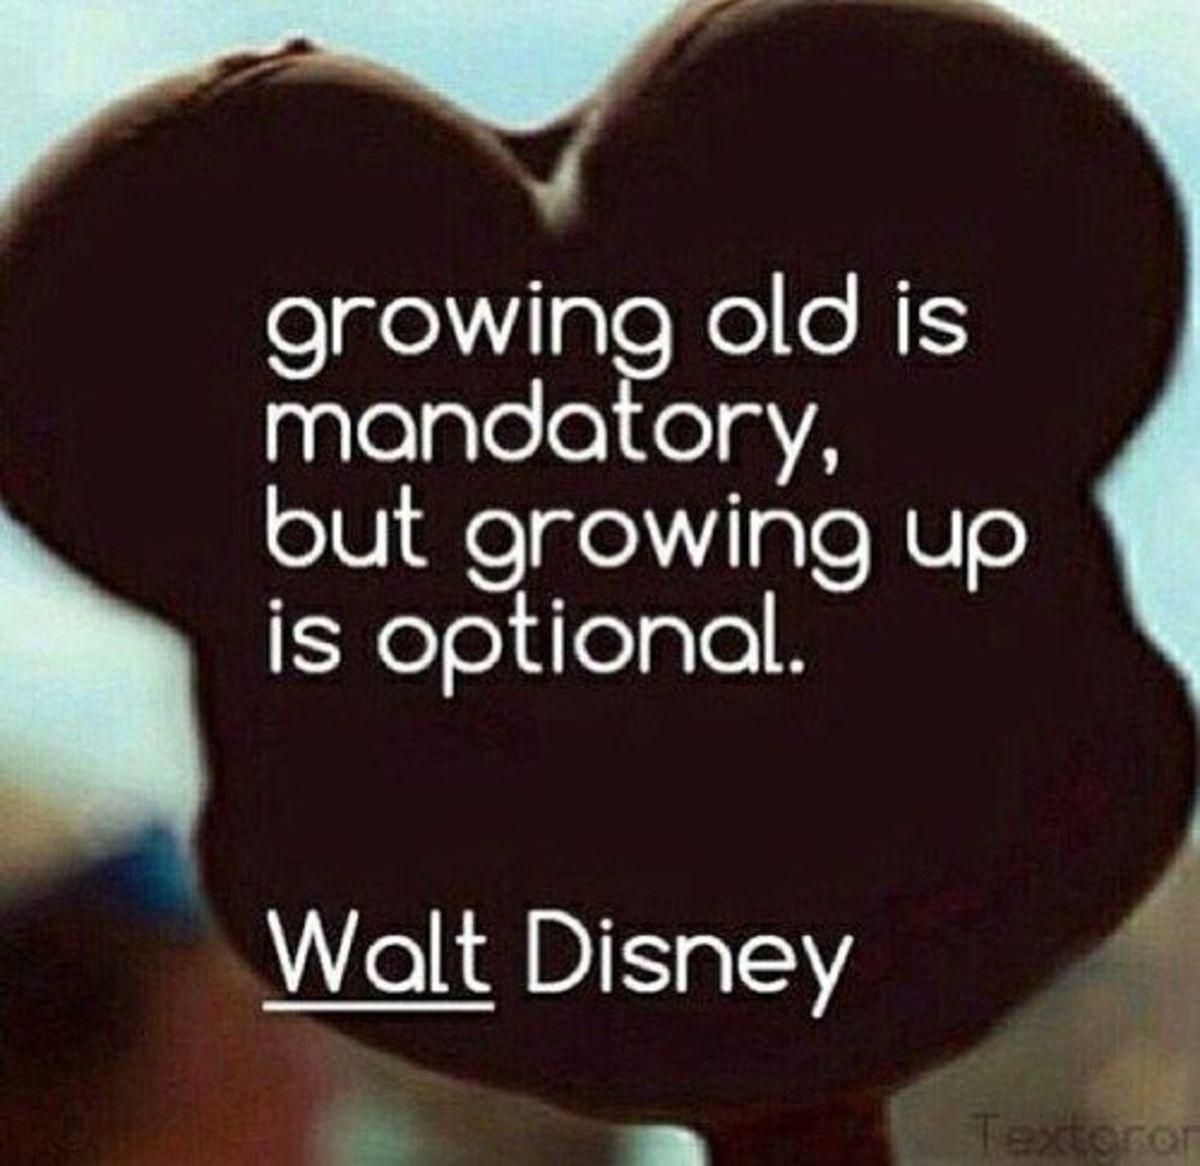 Wise words, Walt.